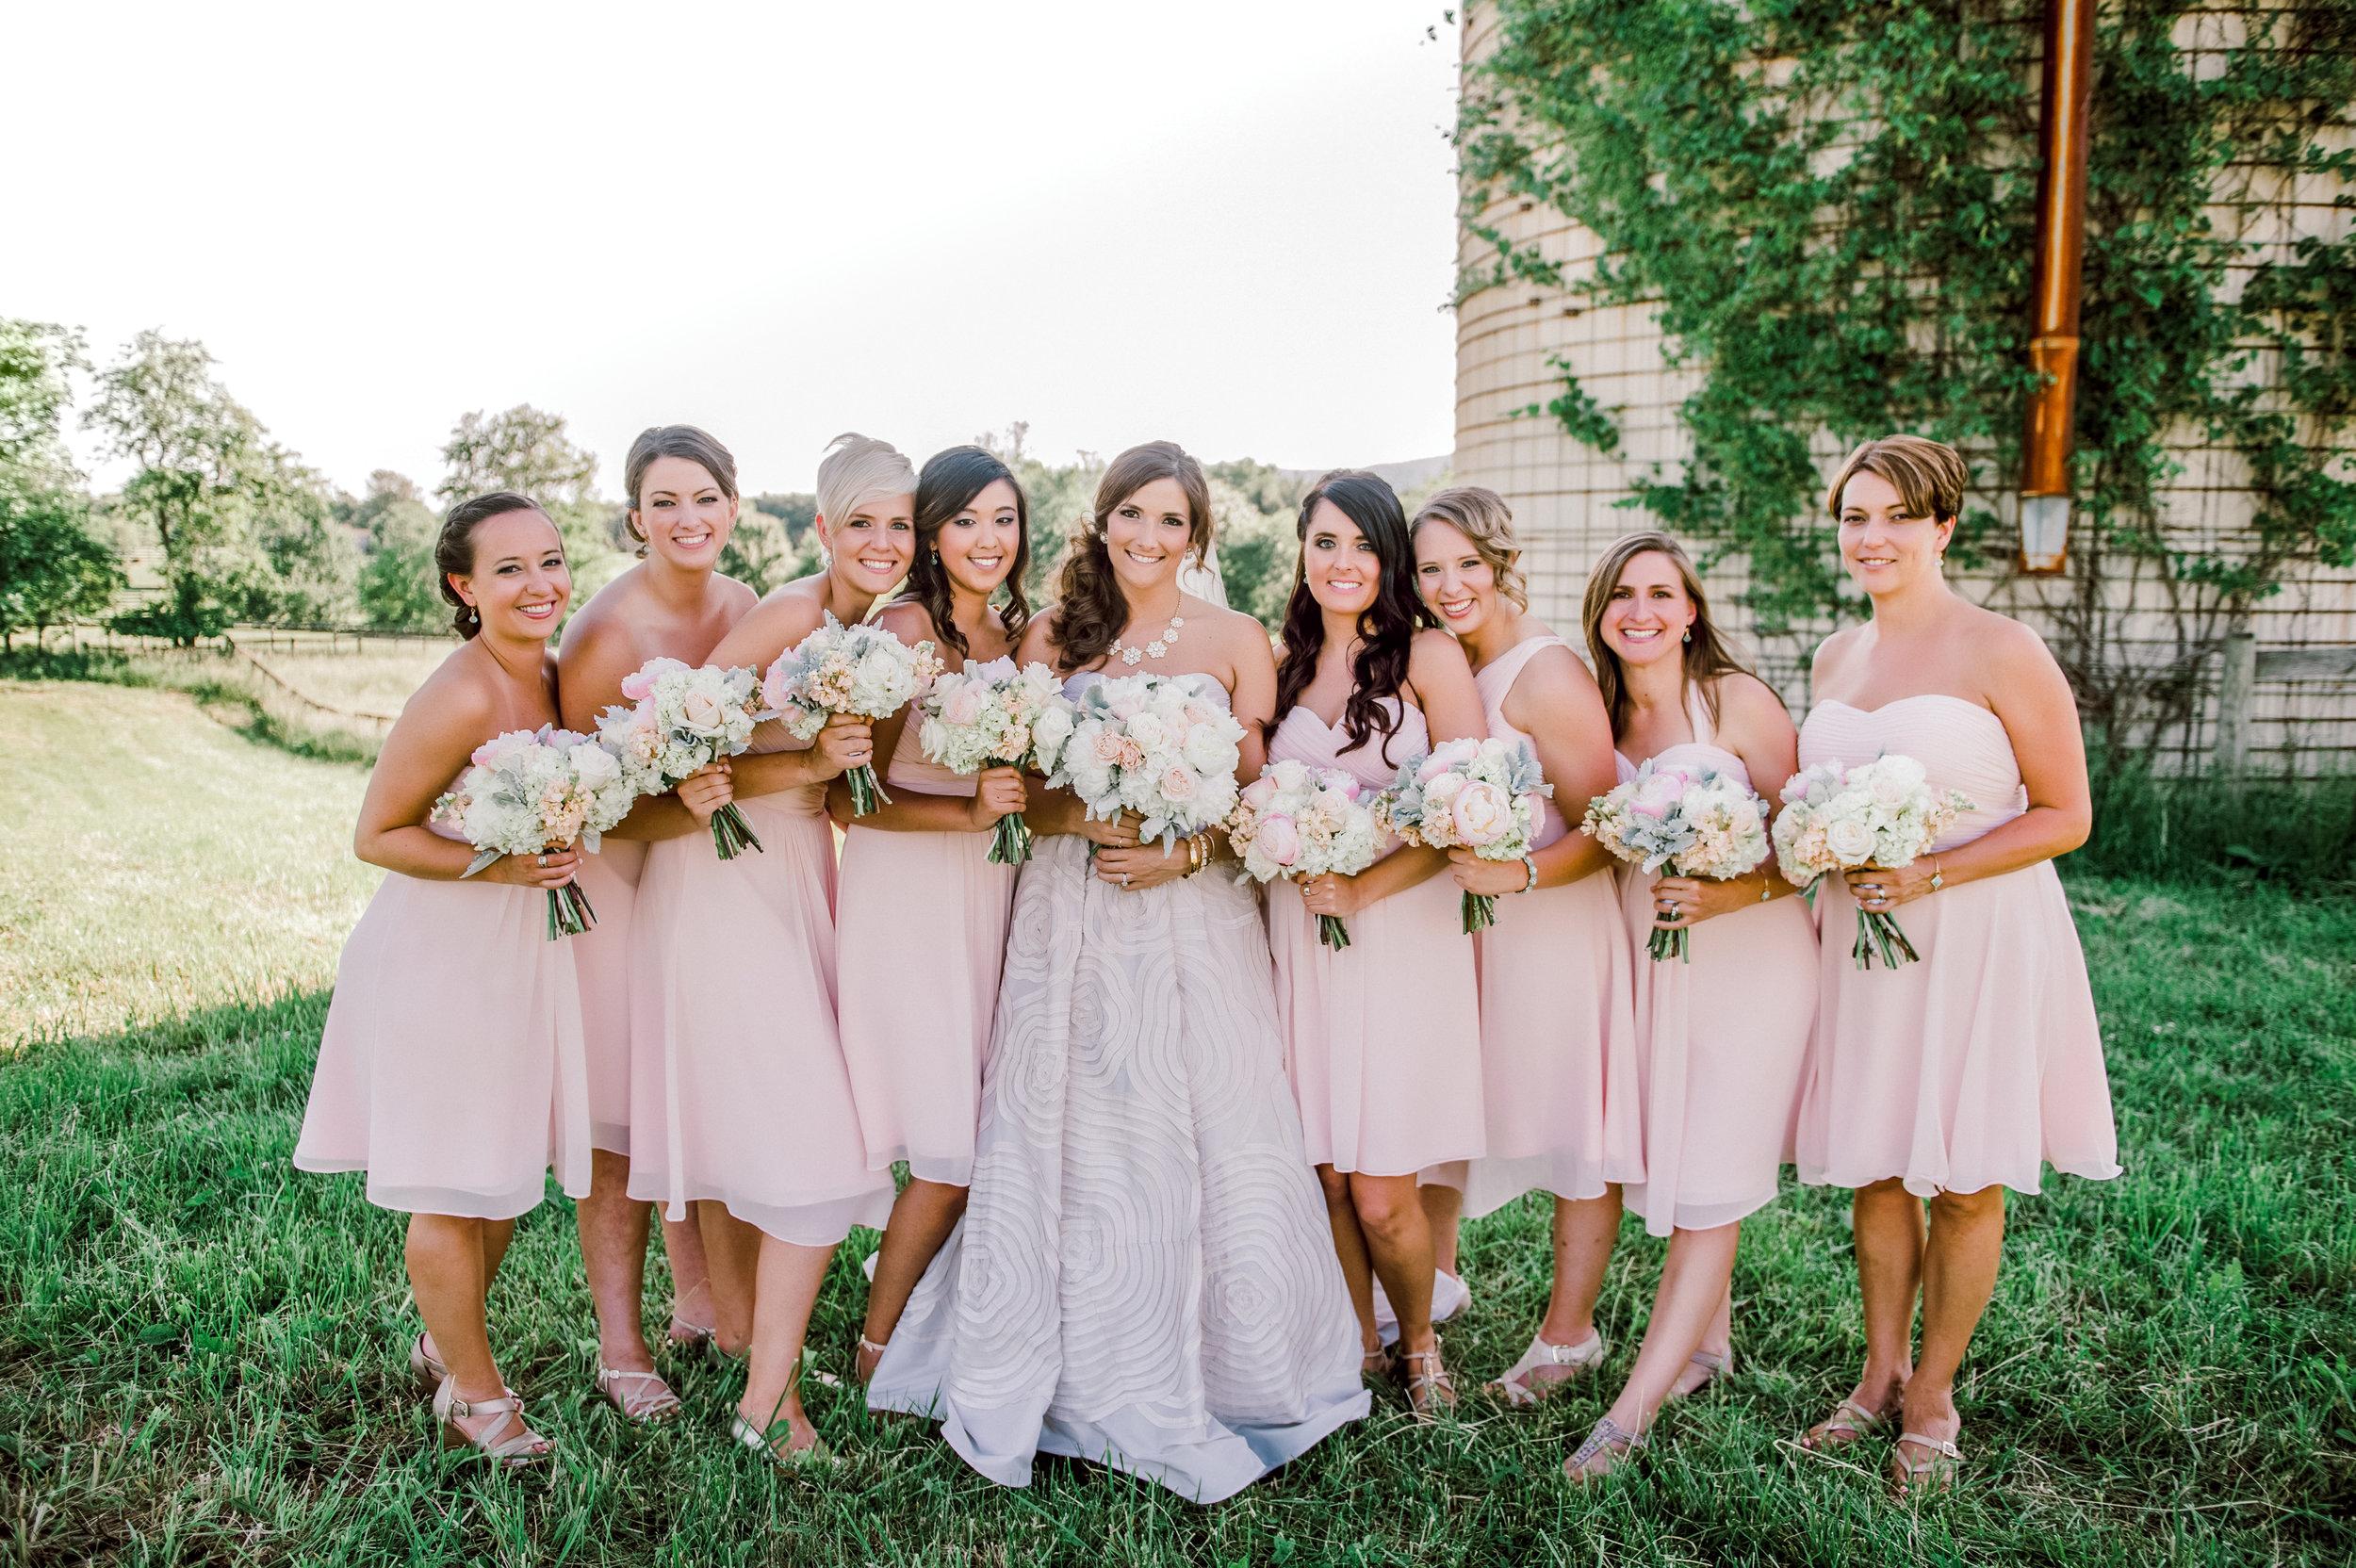 Silverbrook-Farm-Weddings-Virginia-30.jpg